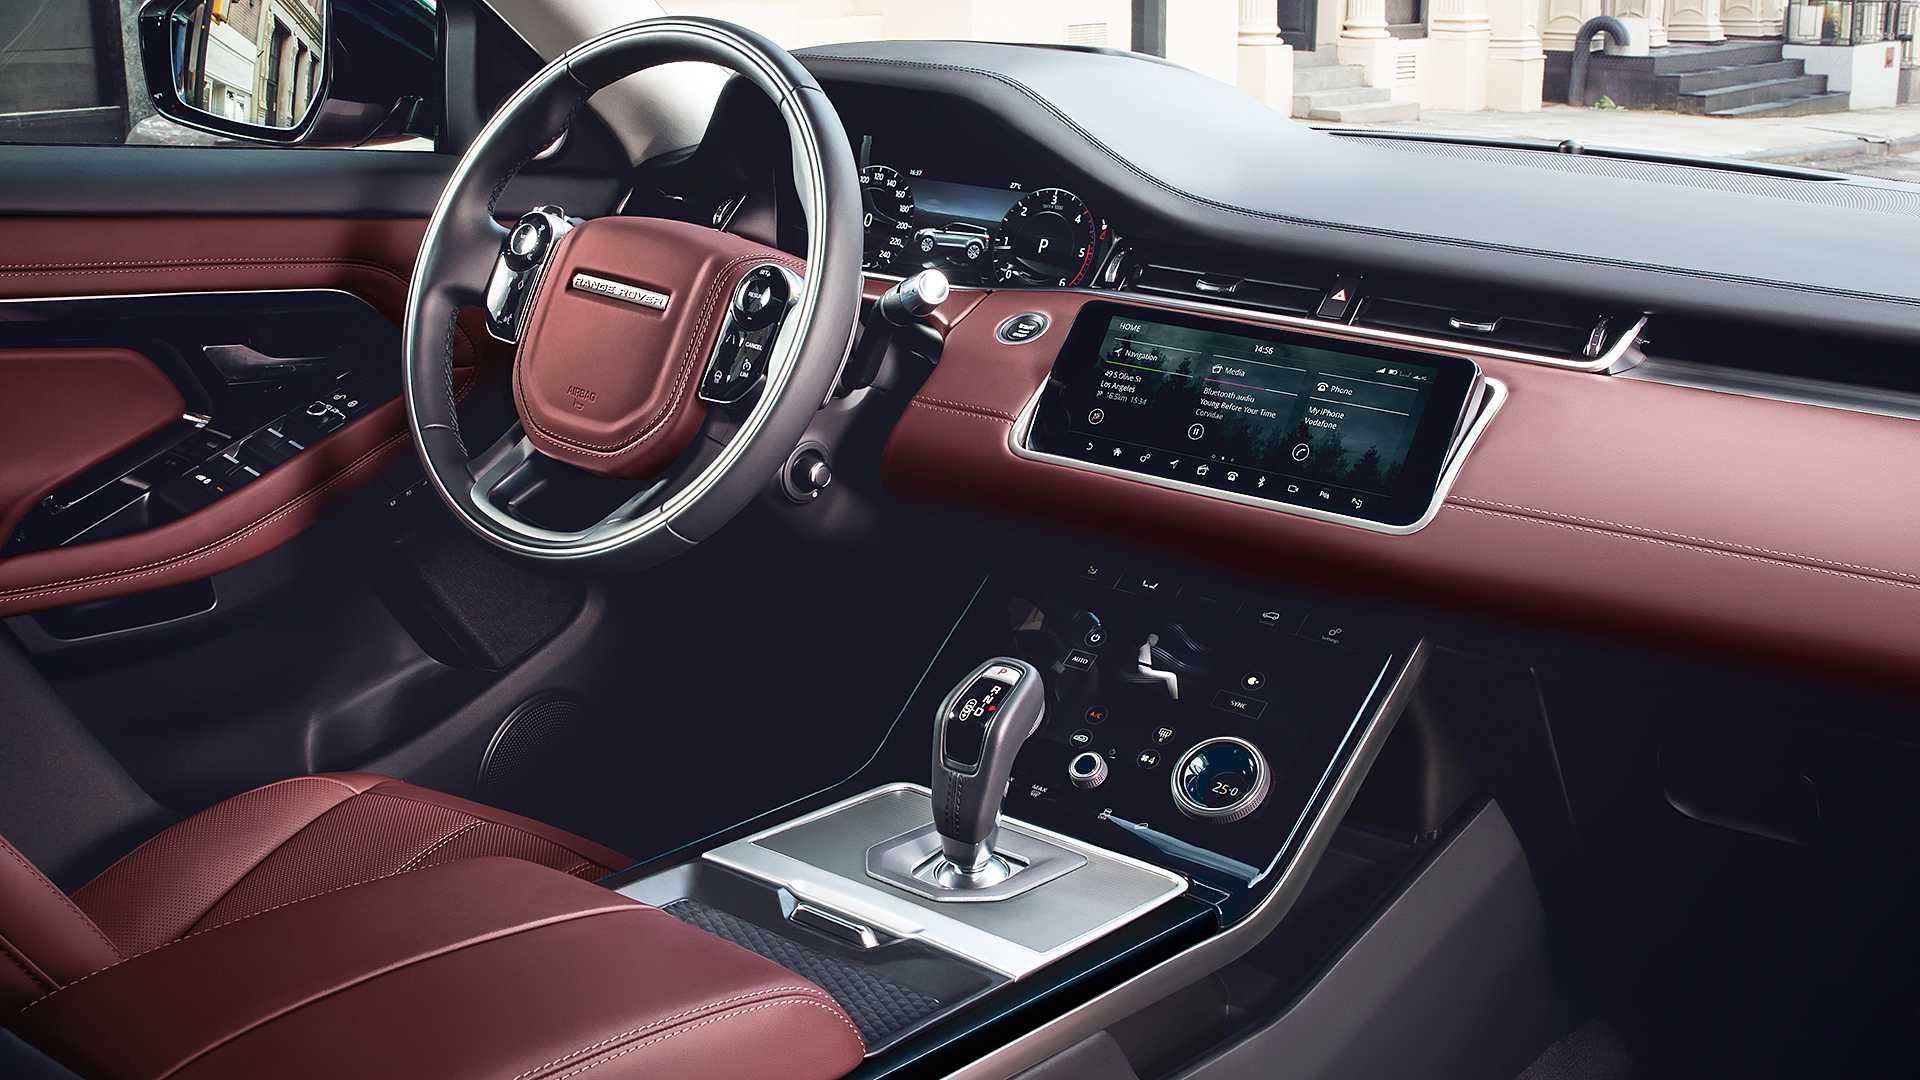 20 New 2020 Range Rover Evoque Specs for 2020 Range Rover Evoque